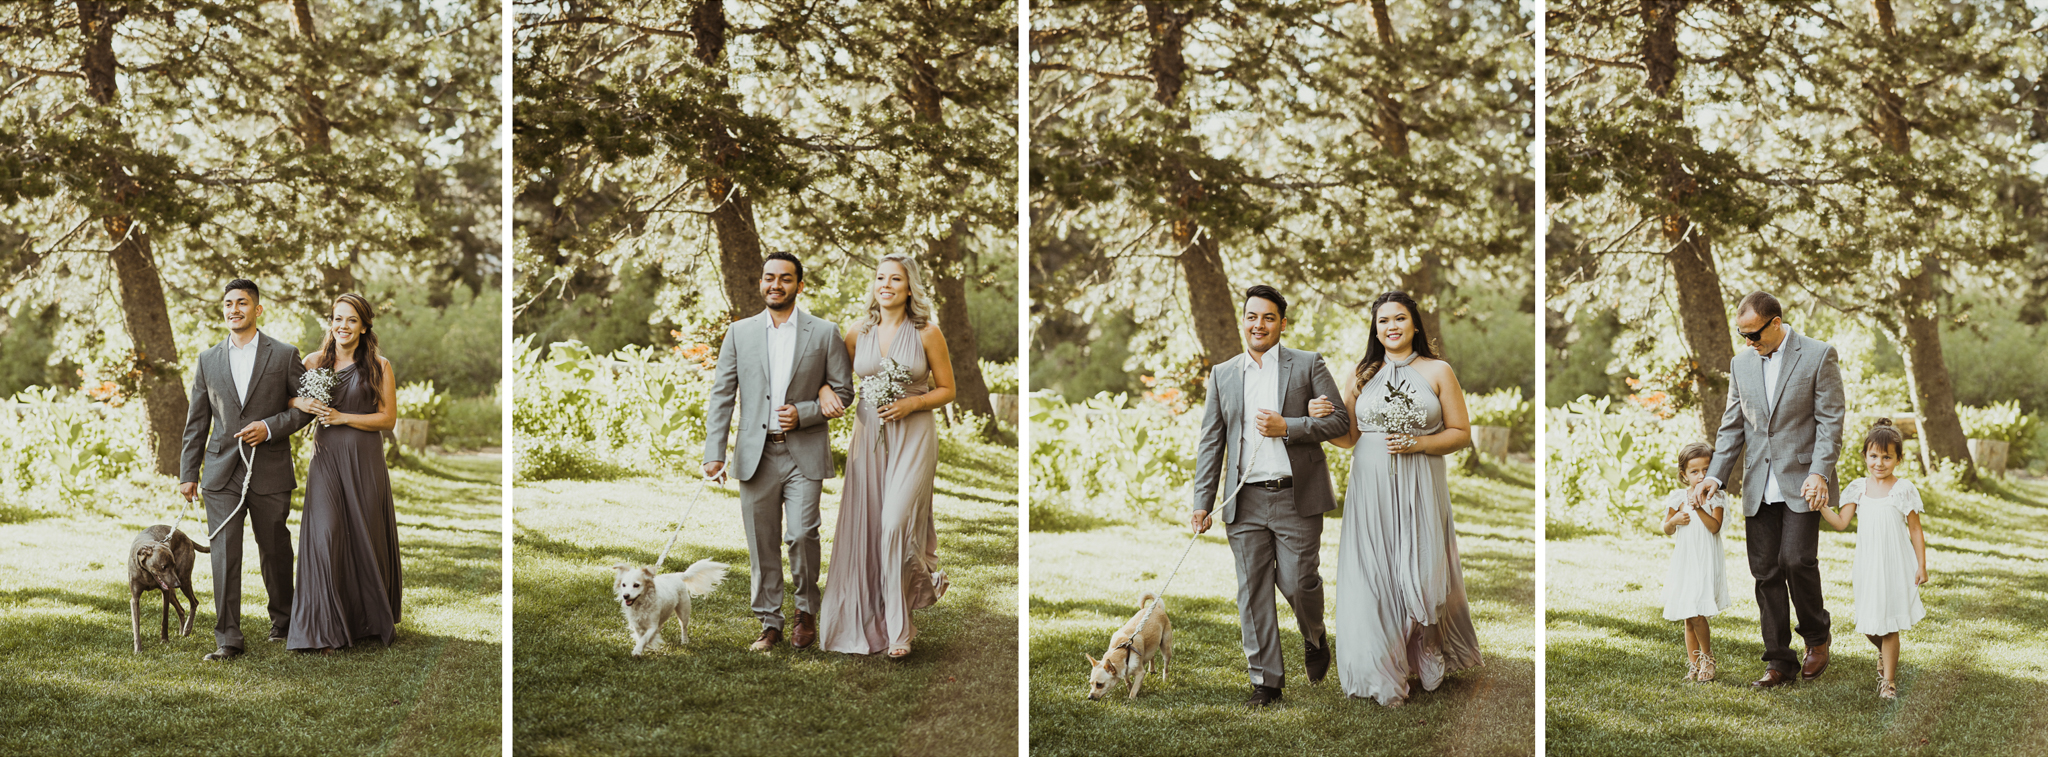 ©Isaiah & Taylor Photography -The Hideout Wedding, Kirkwood California, Lake Tahoe Wedding Photographer-135.jpg